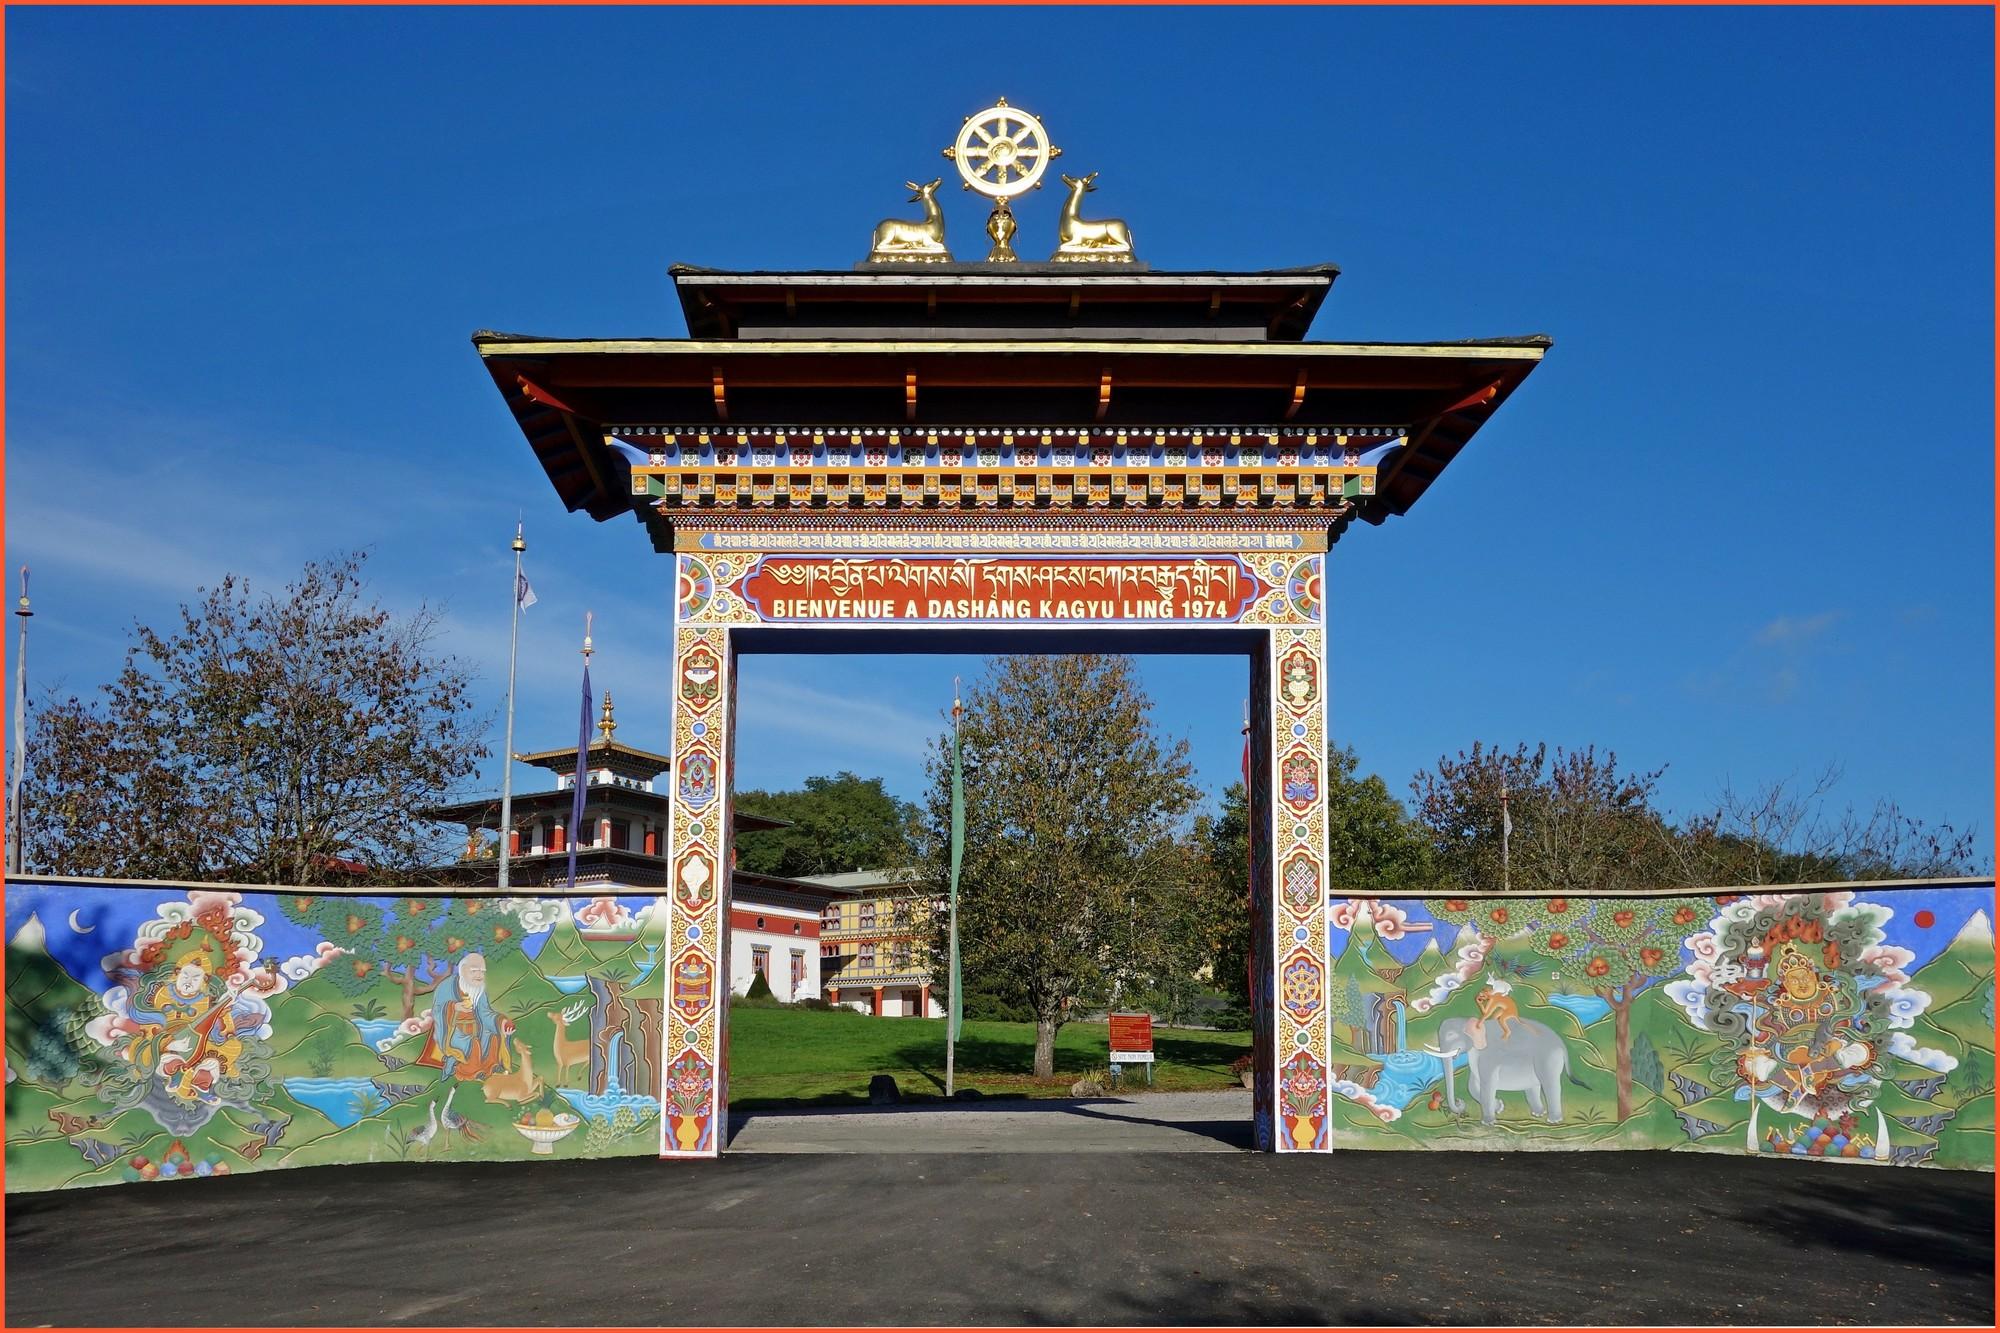 Bienvenue à Dashang Kagyu Ling